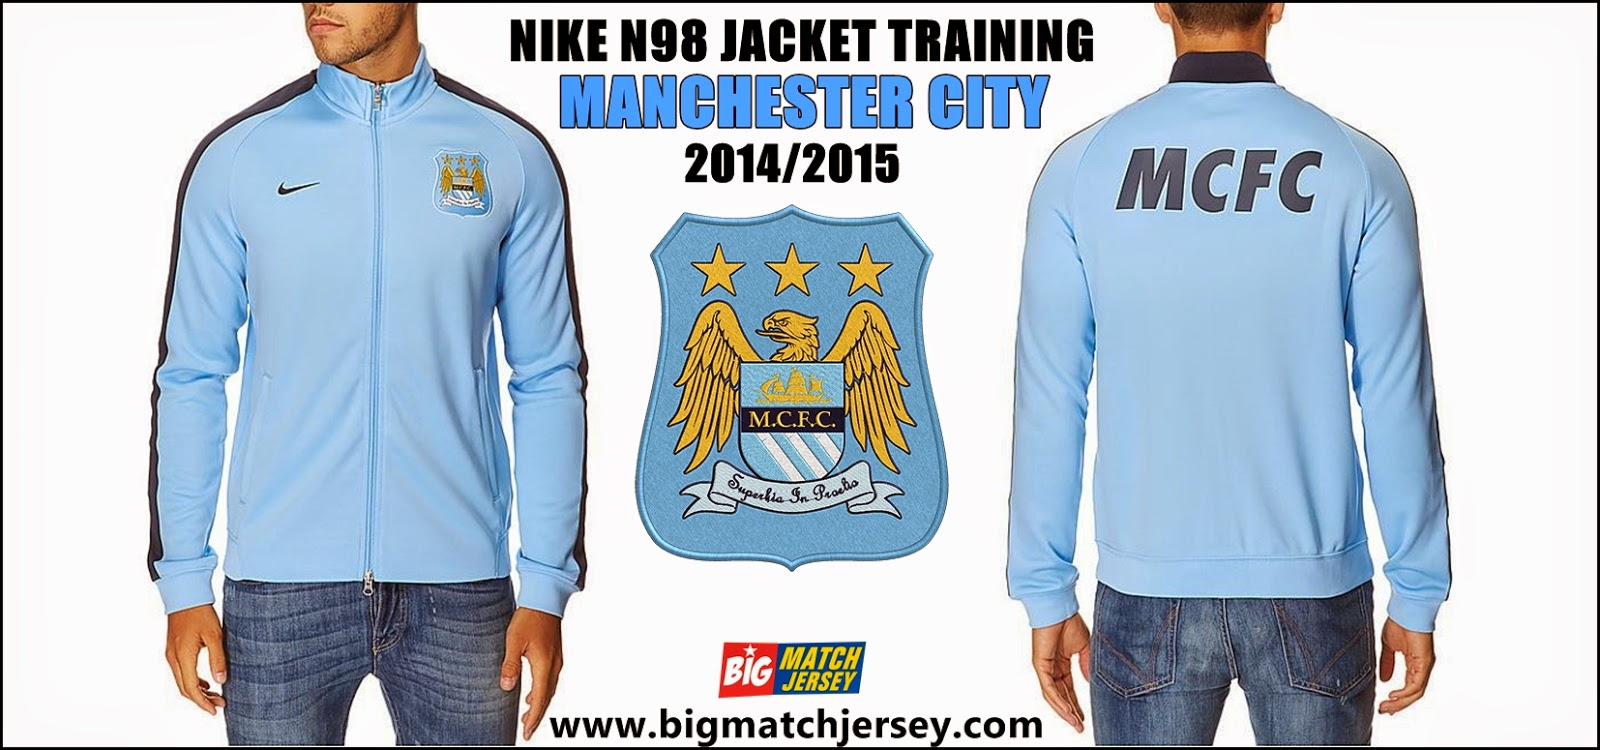 Nike Manchester City 14 15 N98 Jacket